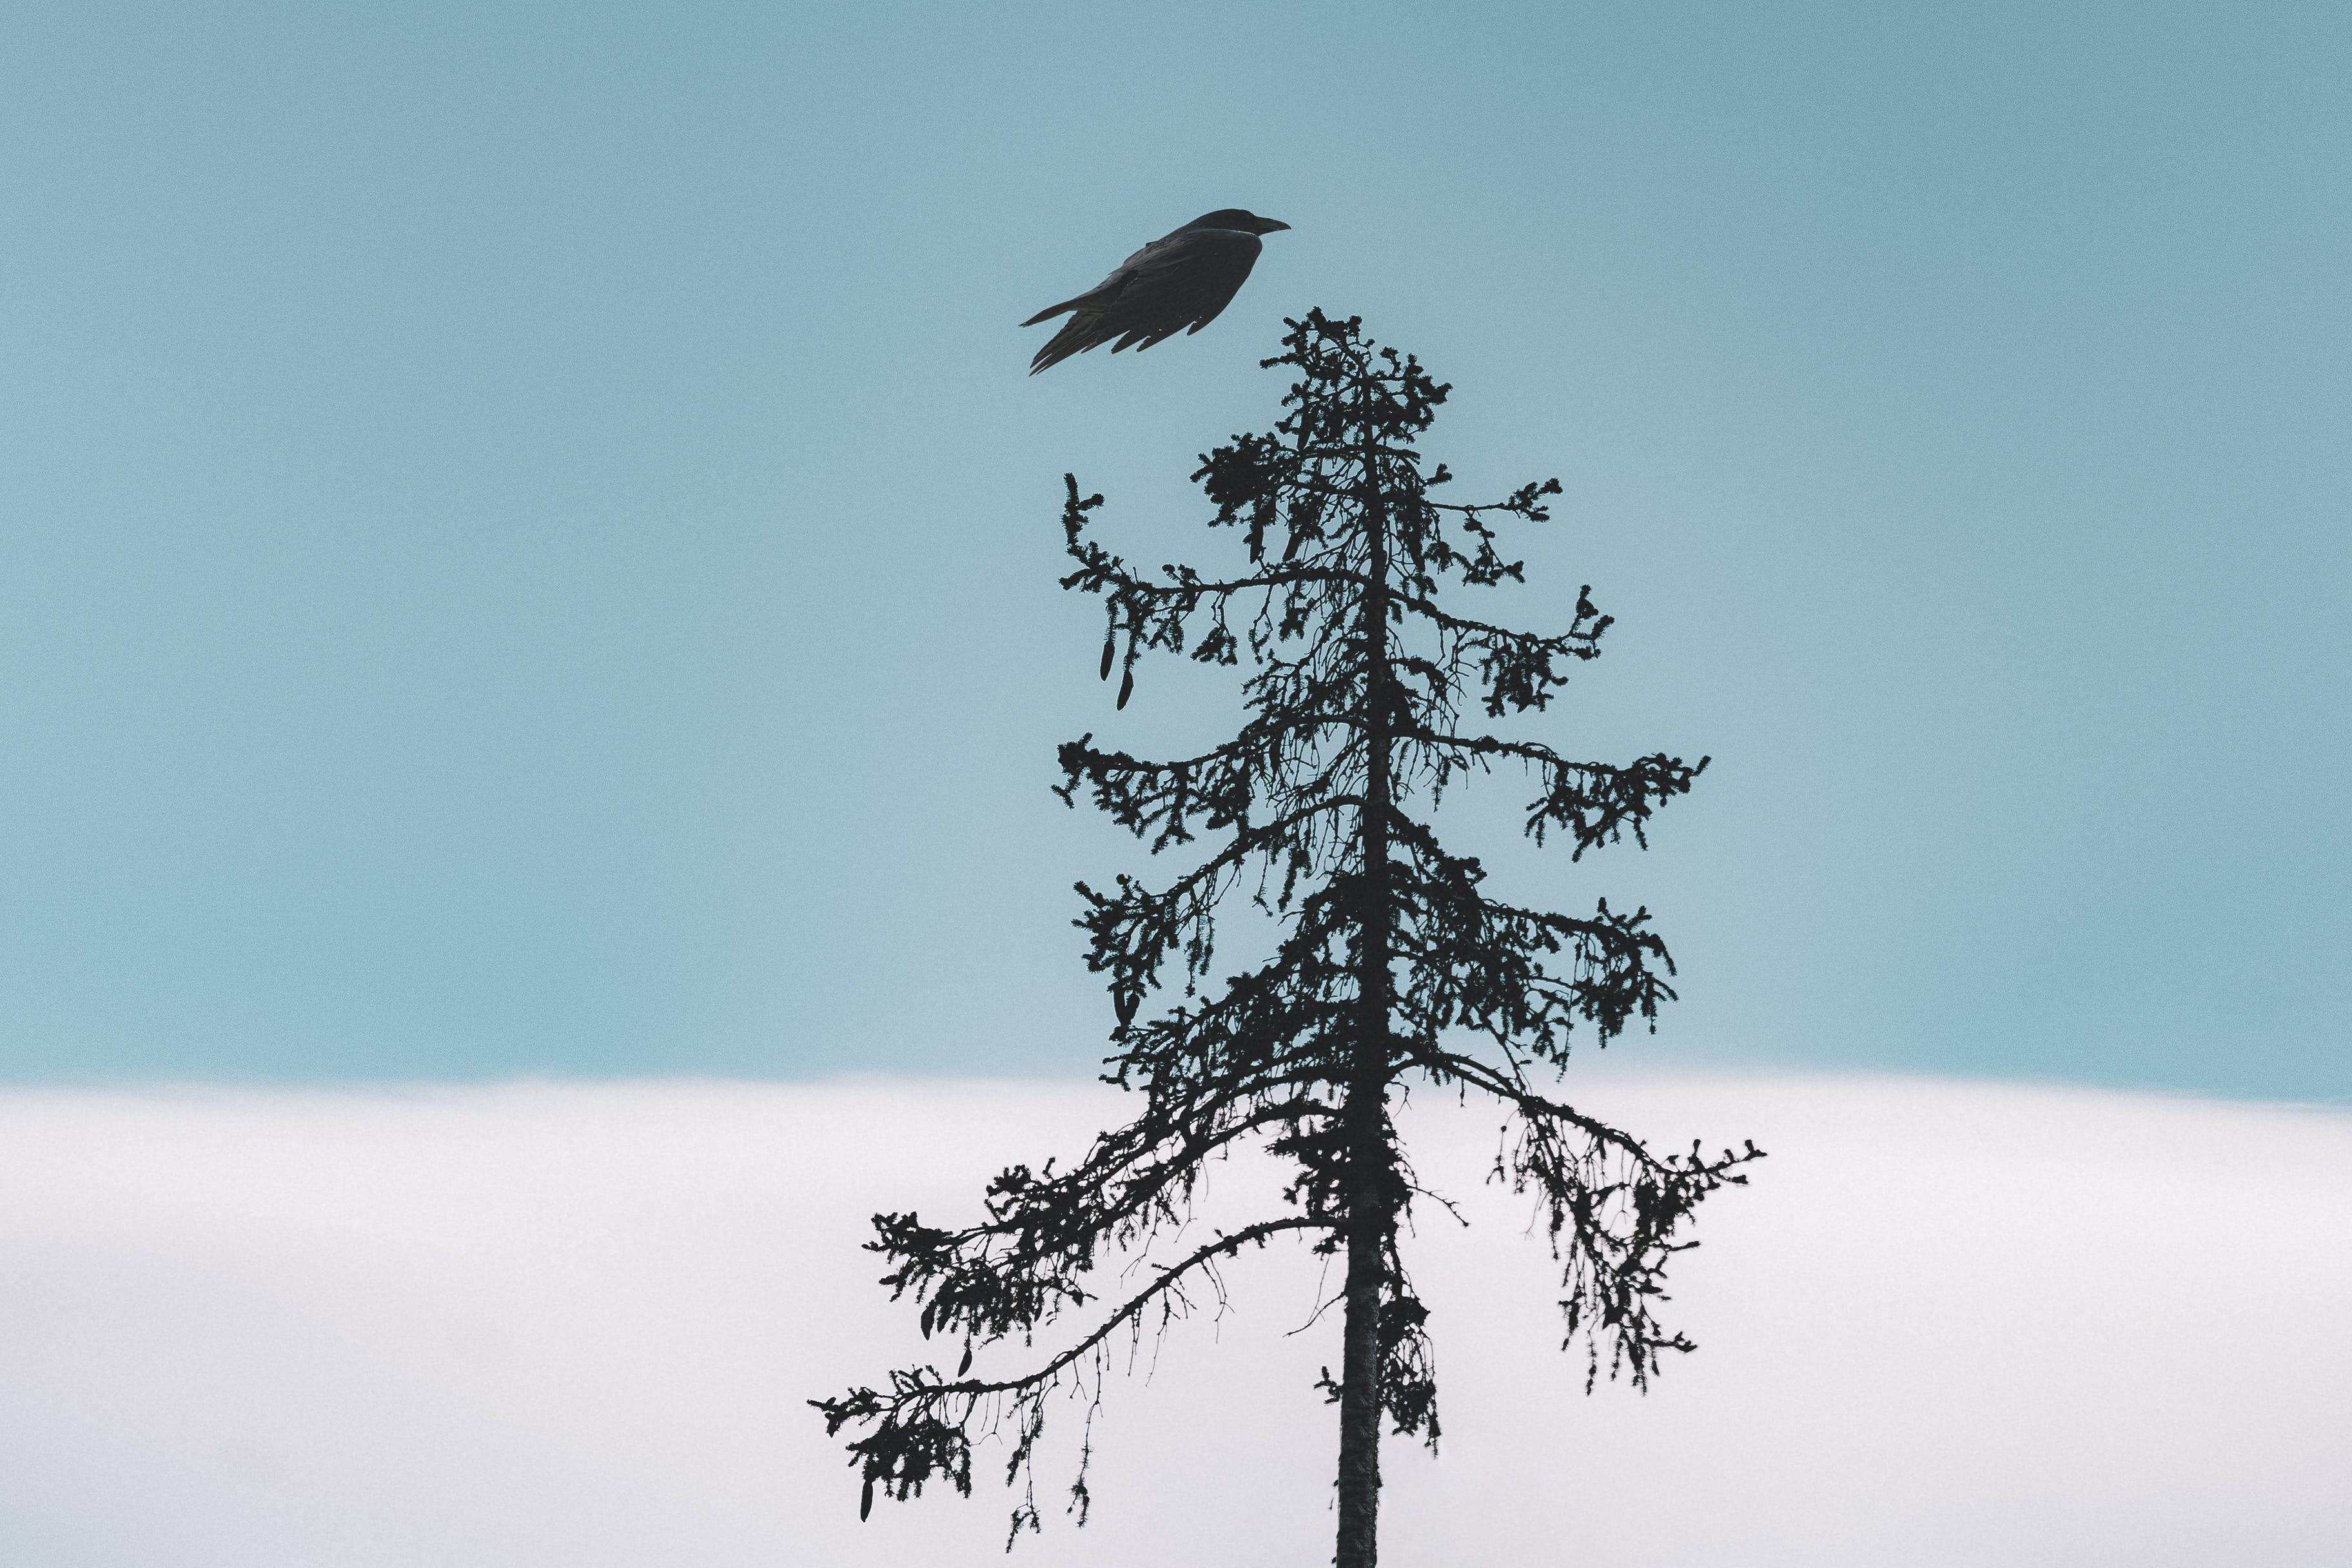 Black Bird Flying Over Tree